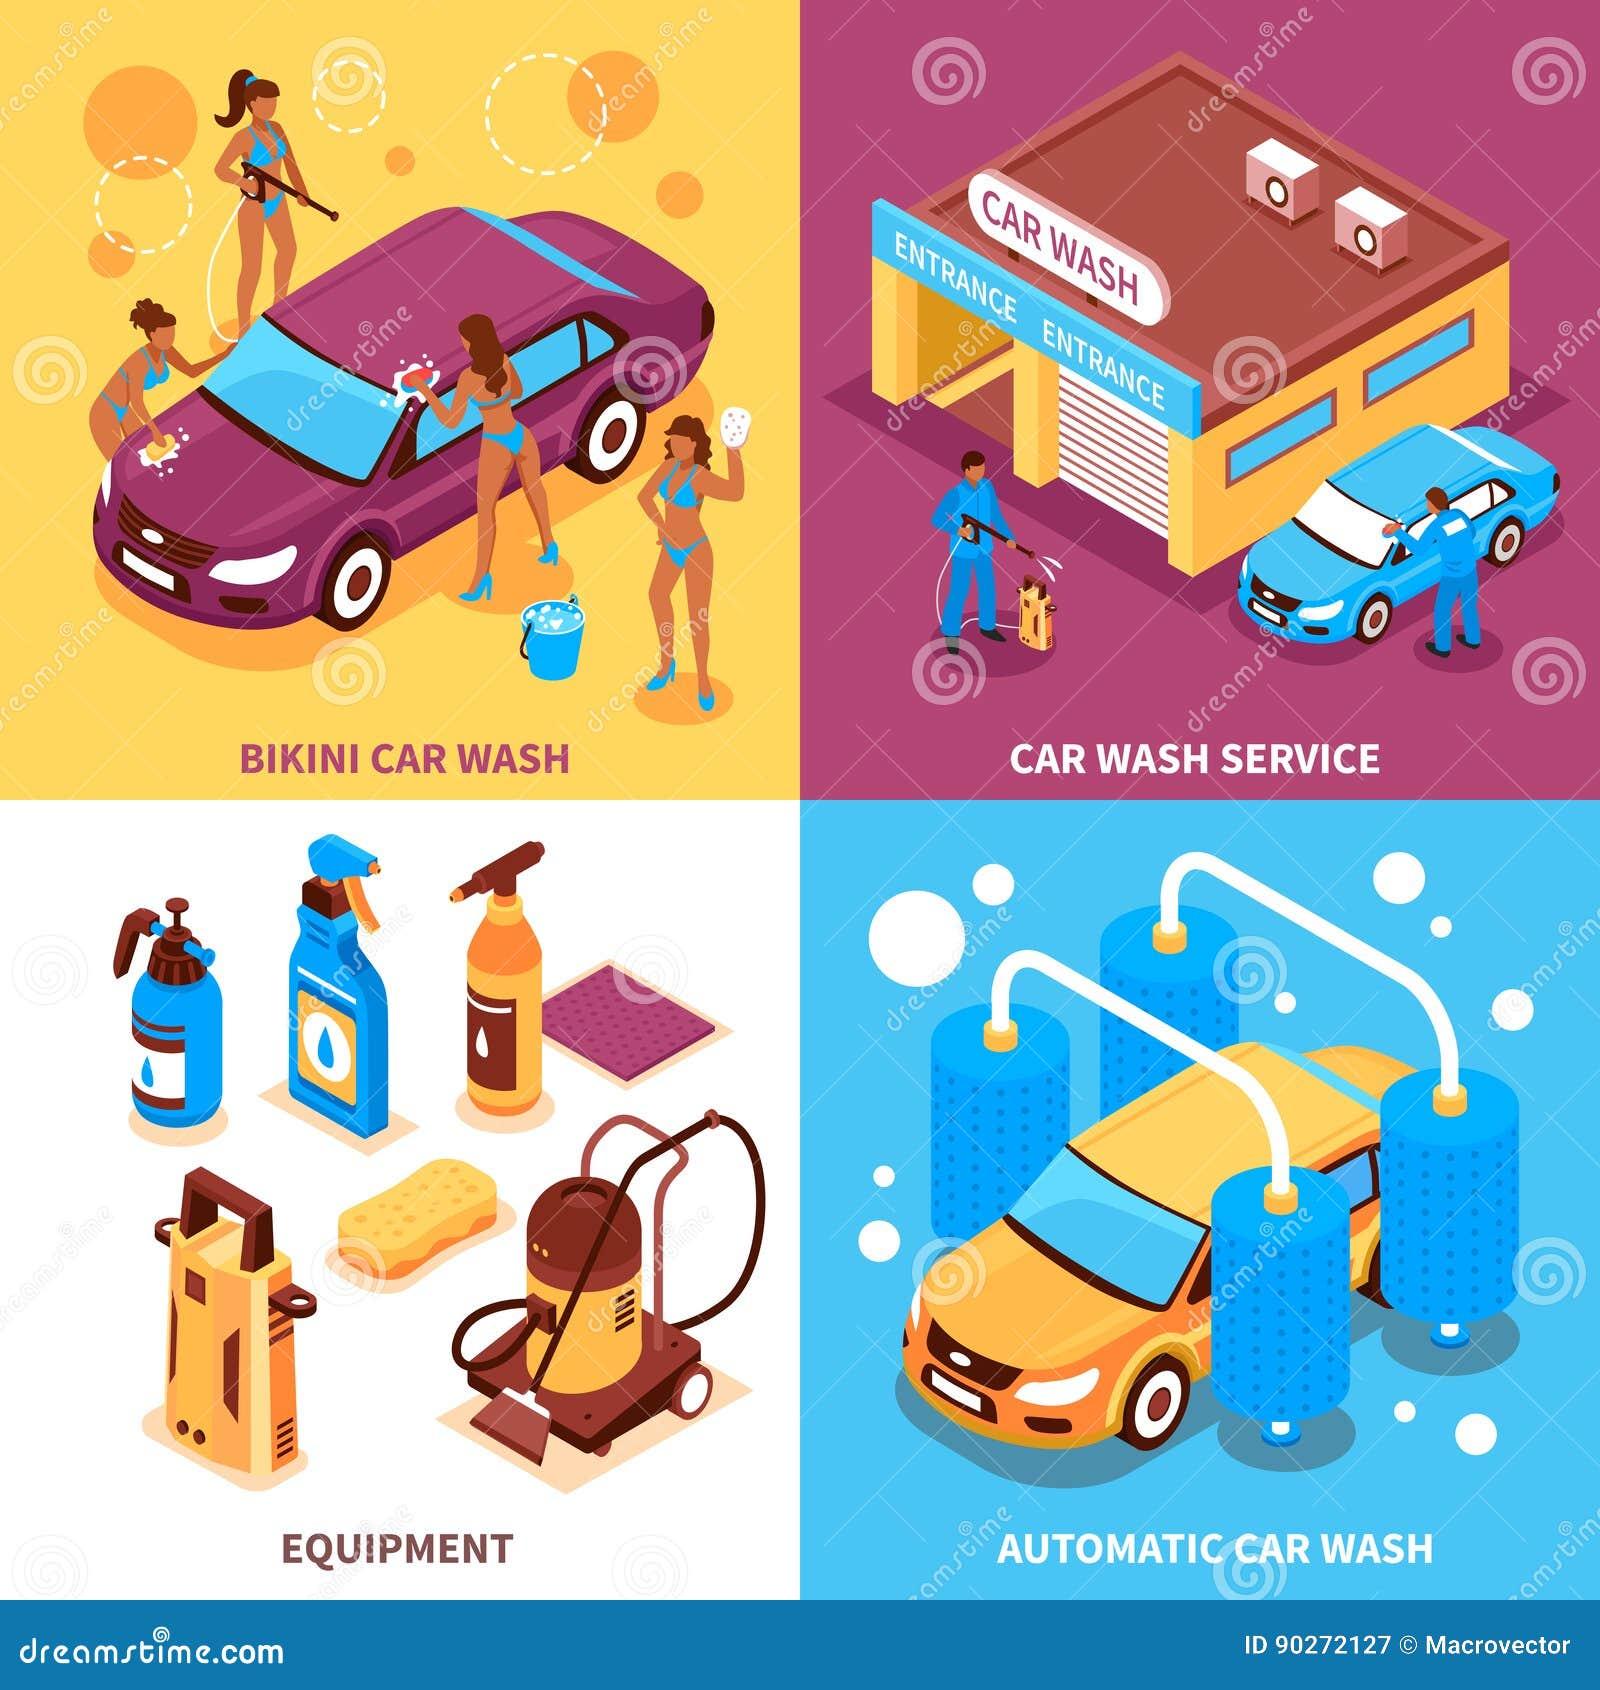 Sponge Cartoons, Illustrations & Vector Stock Images